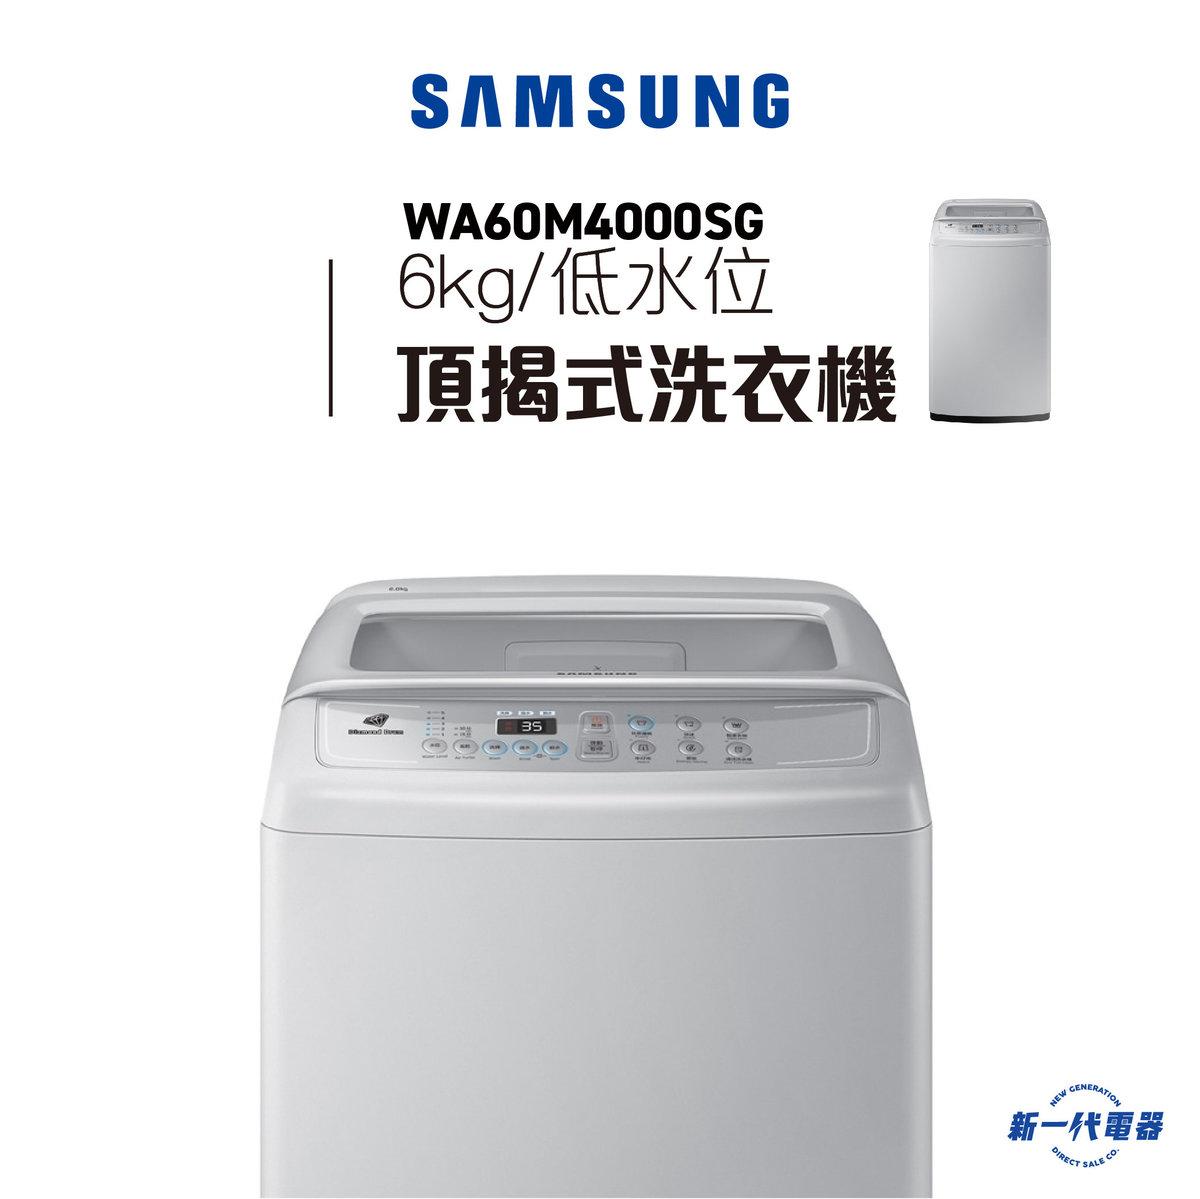 WA60M4000SG 頂揭式 低排水位 6kg 淺灰色